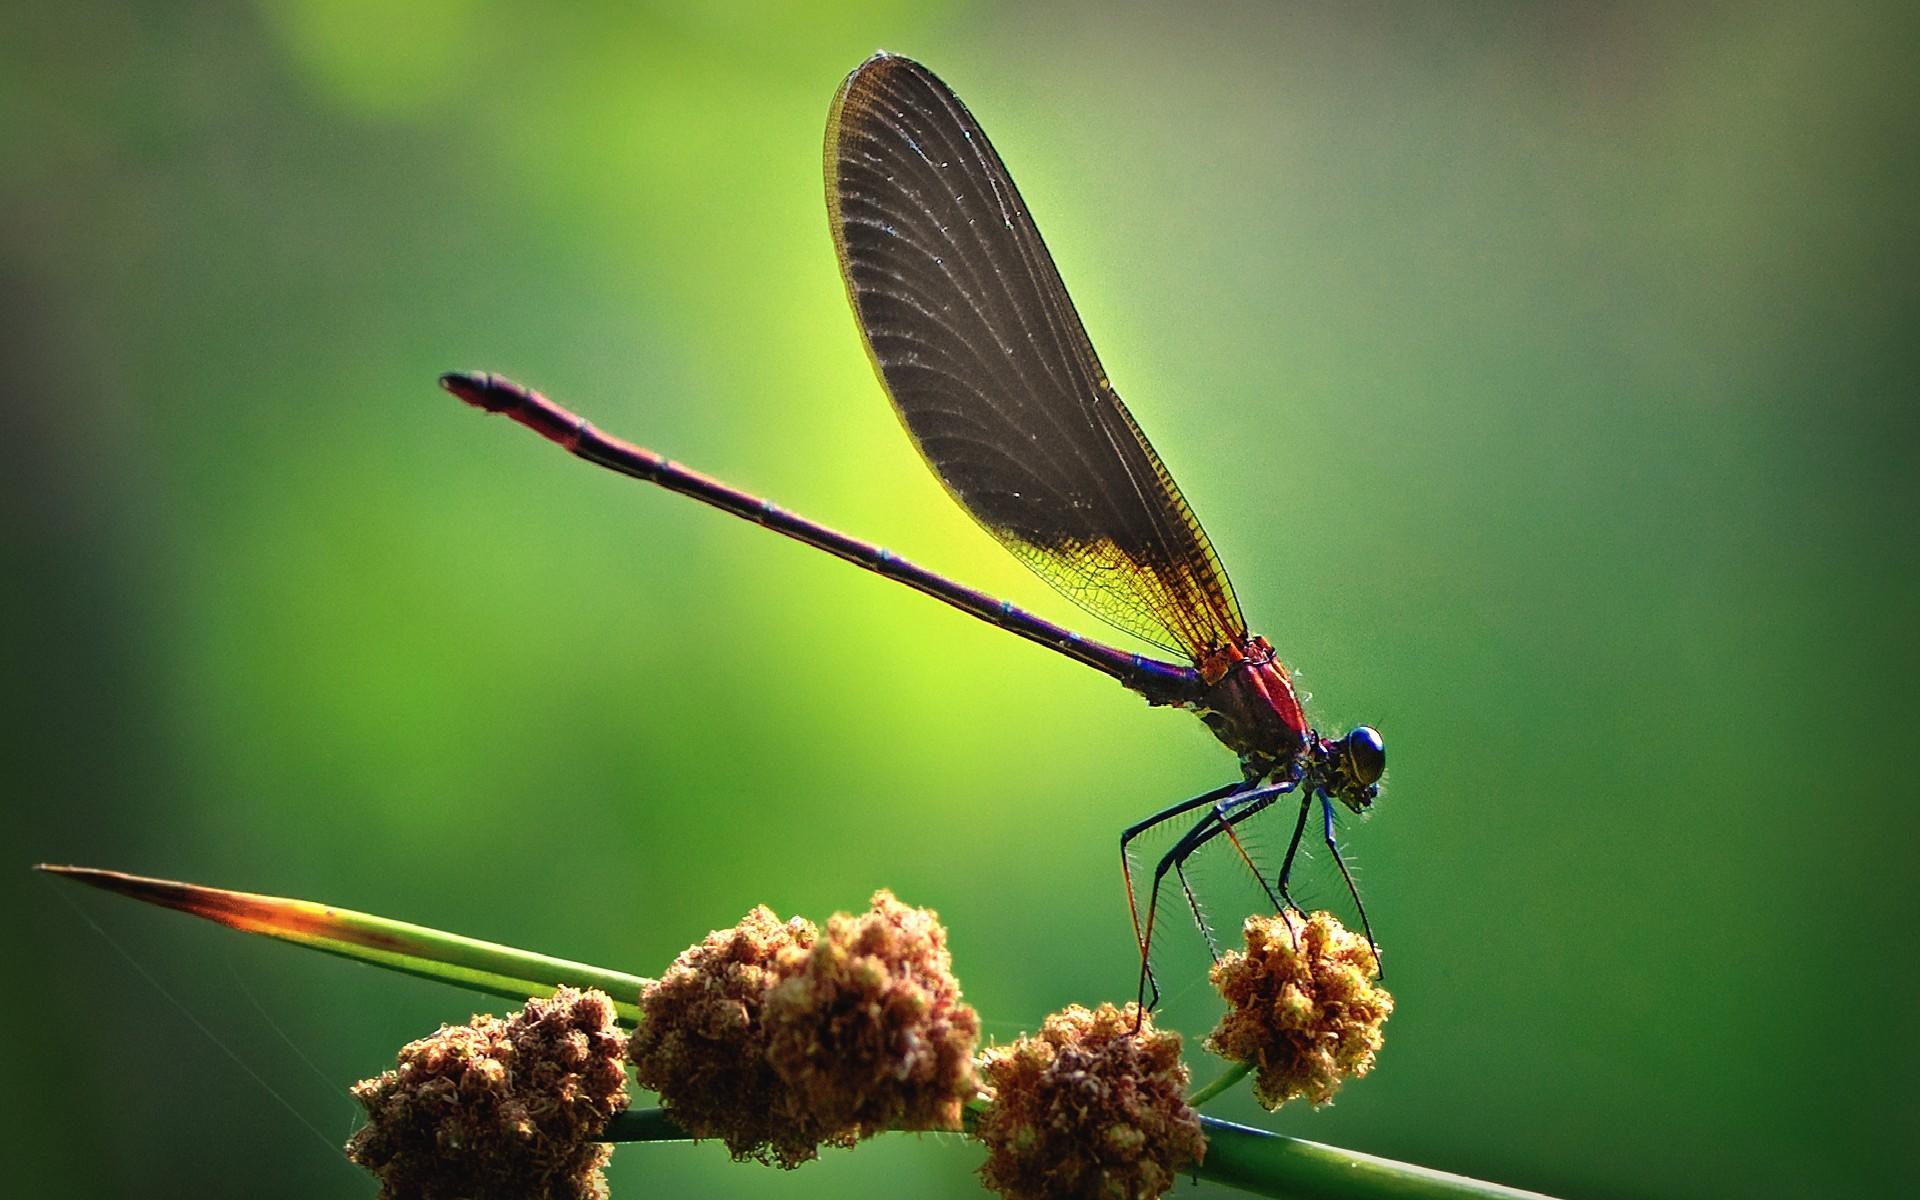 dragonfly wallpapers - wallpapersafari